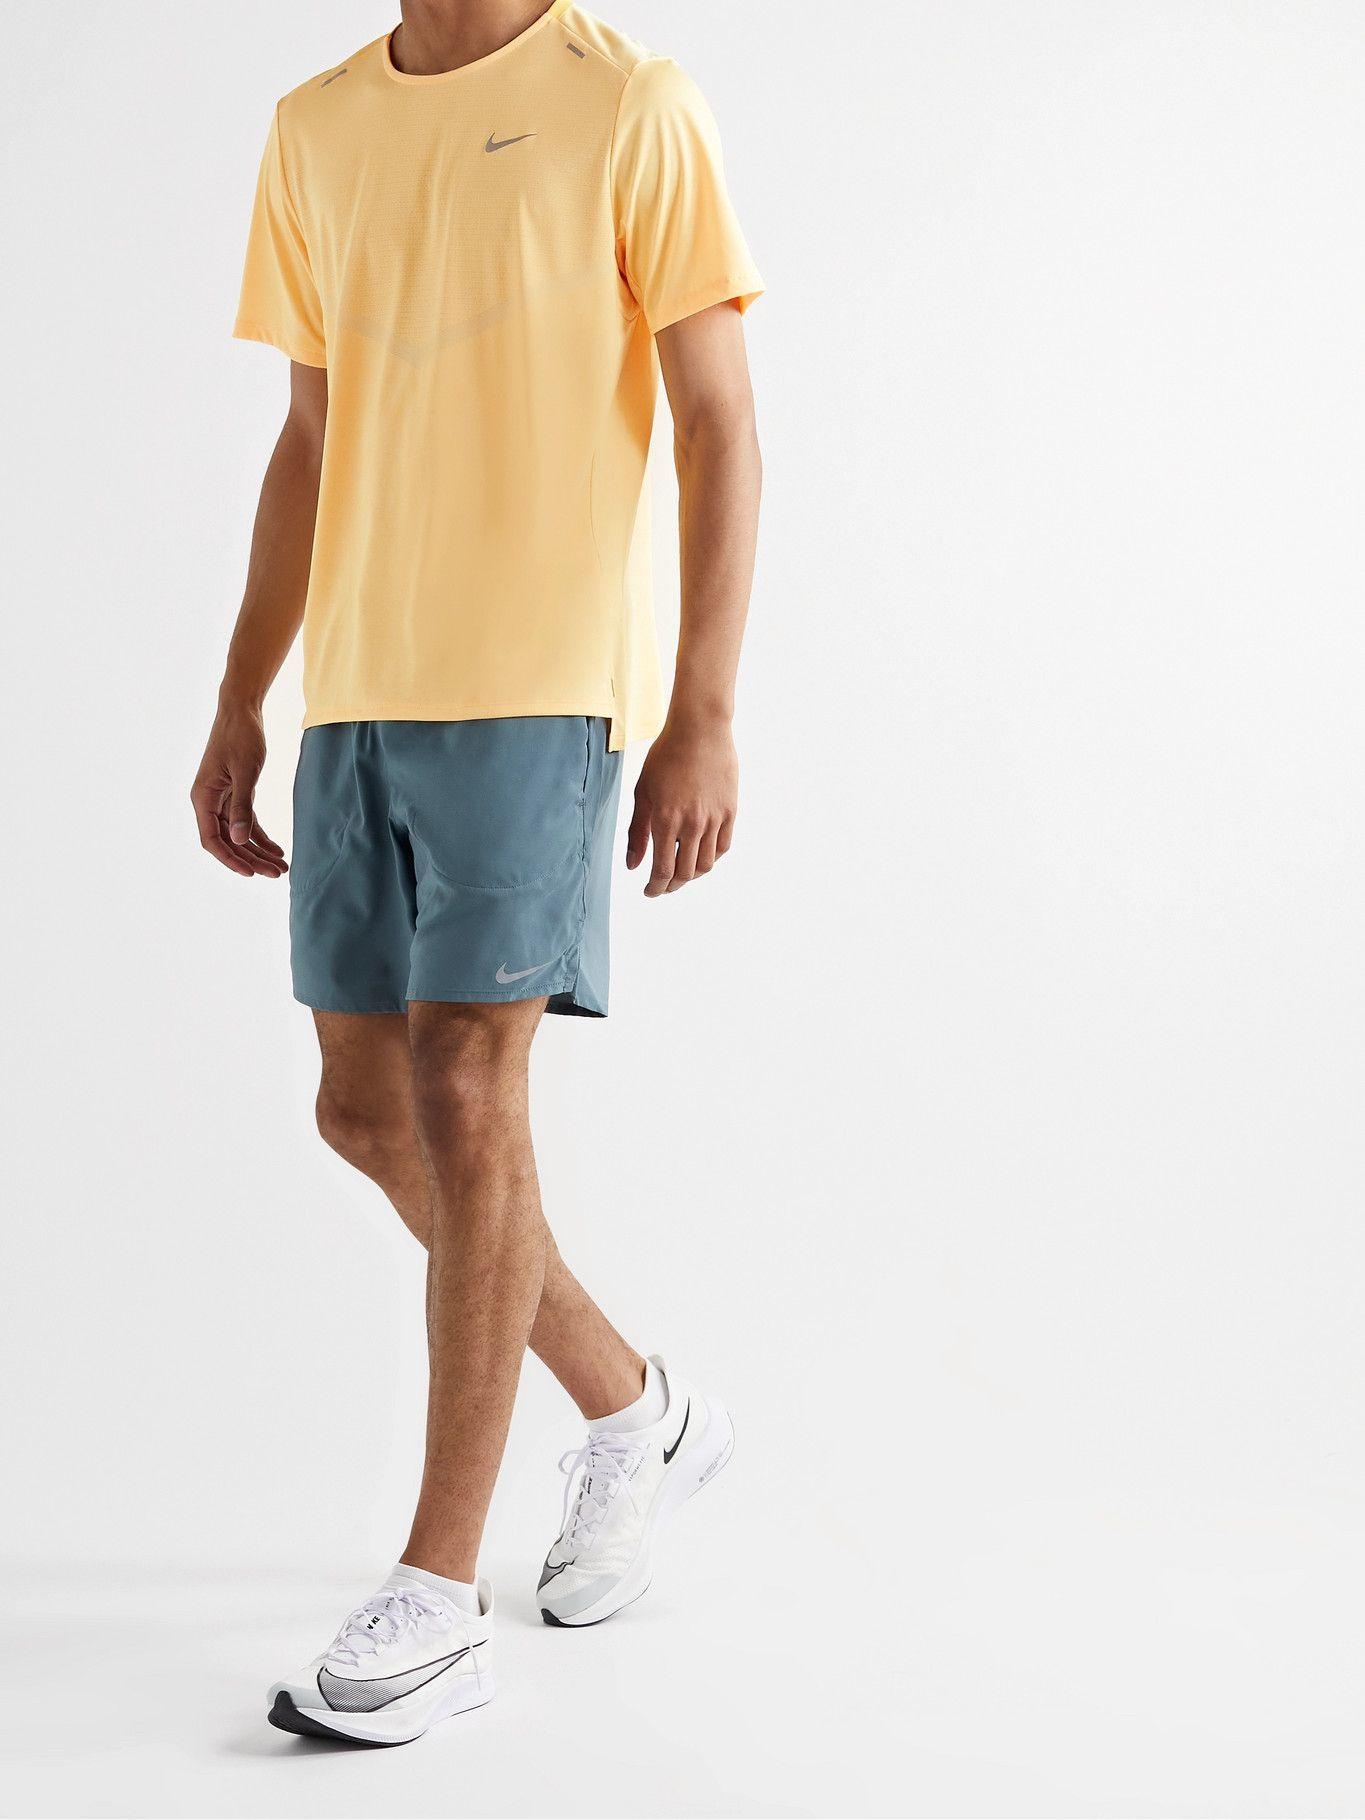 NIKE RUNNING - Rise 365 Dri-FIT T-Shirt - Orange